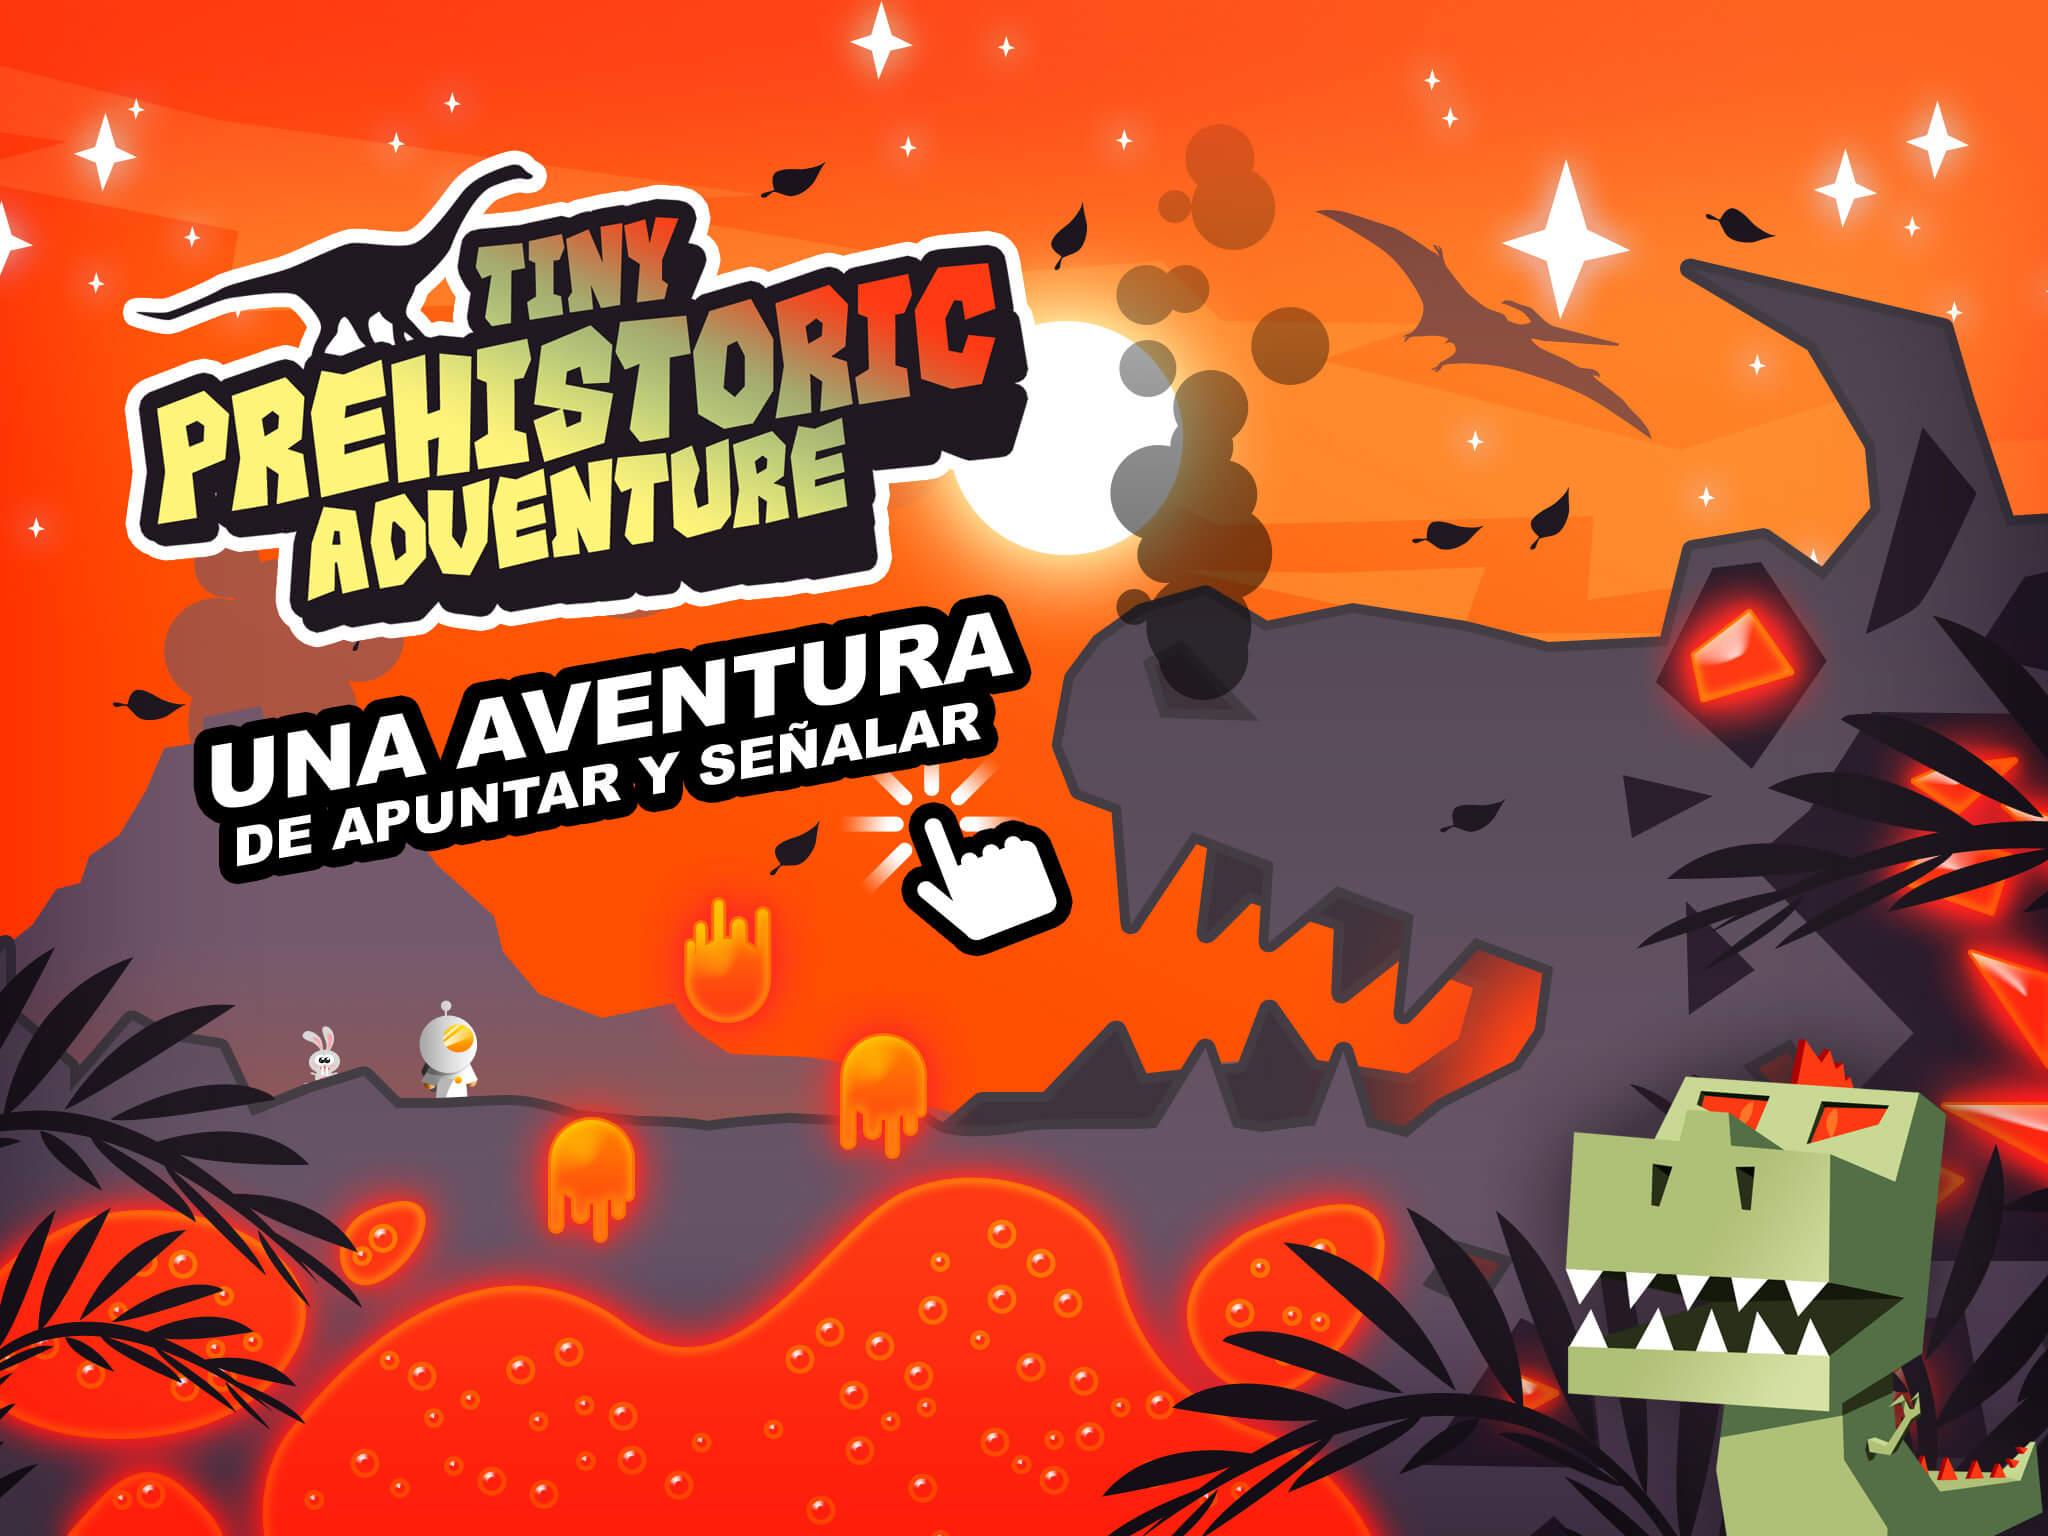 prehistoric_screenshot_01_es